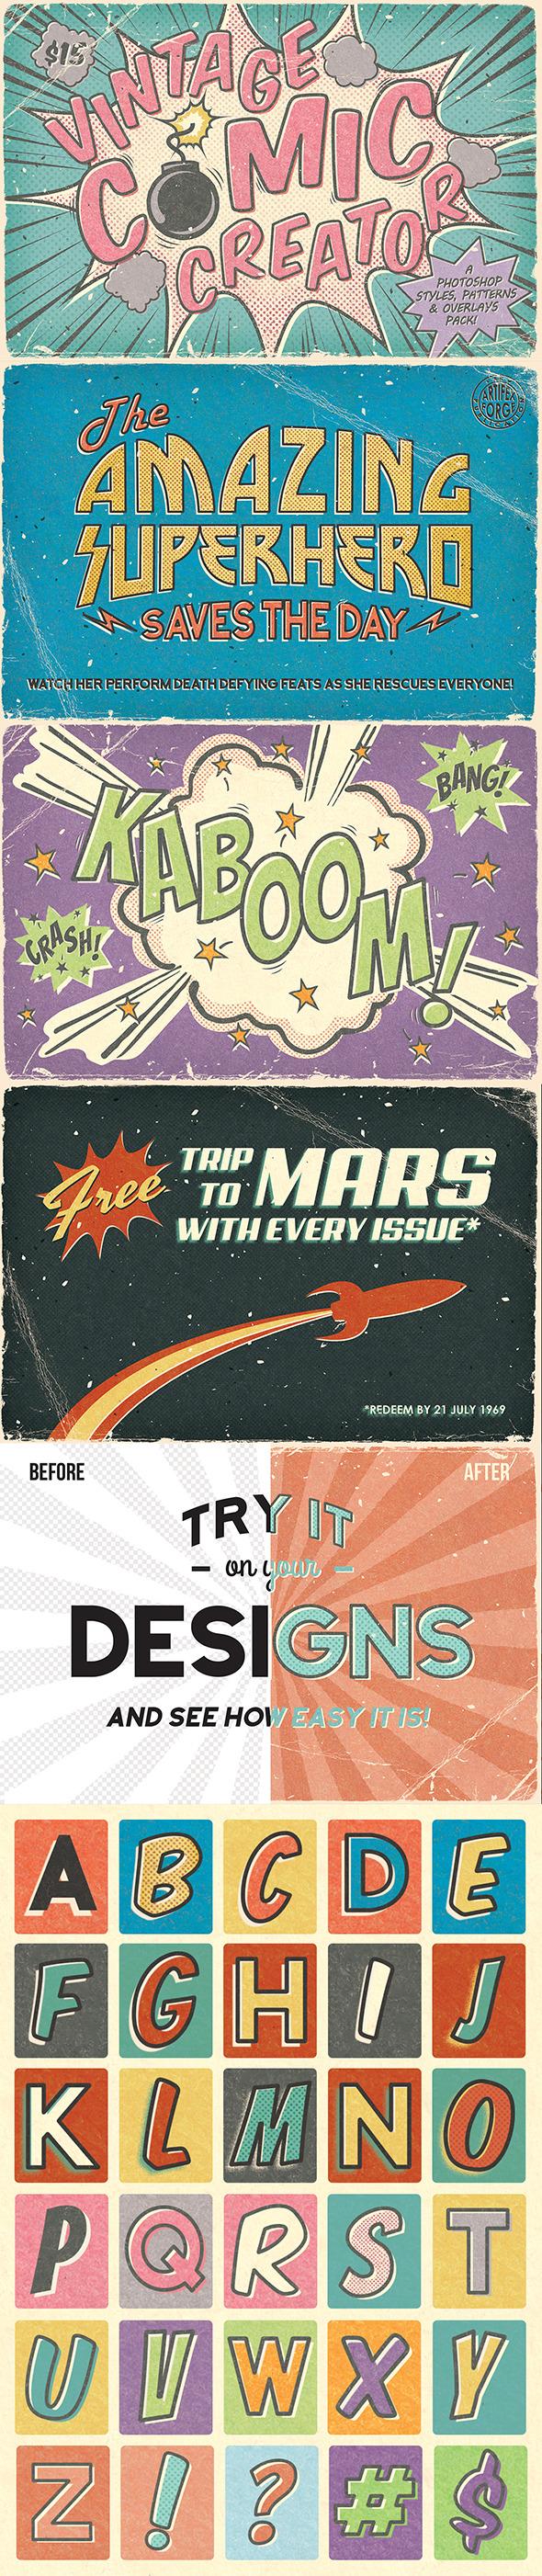 Vintage Comic Creator - Styles Photoshop